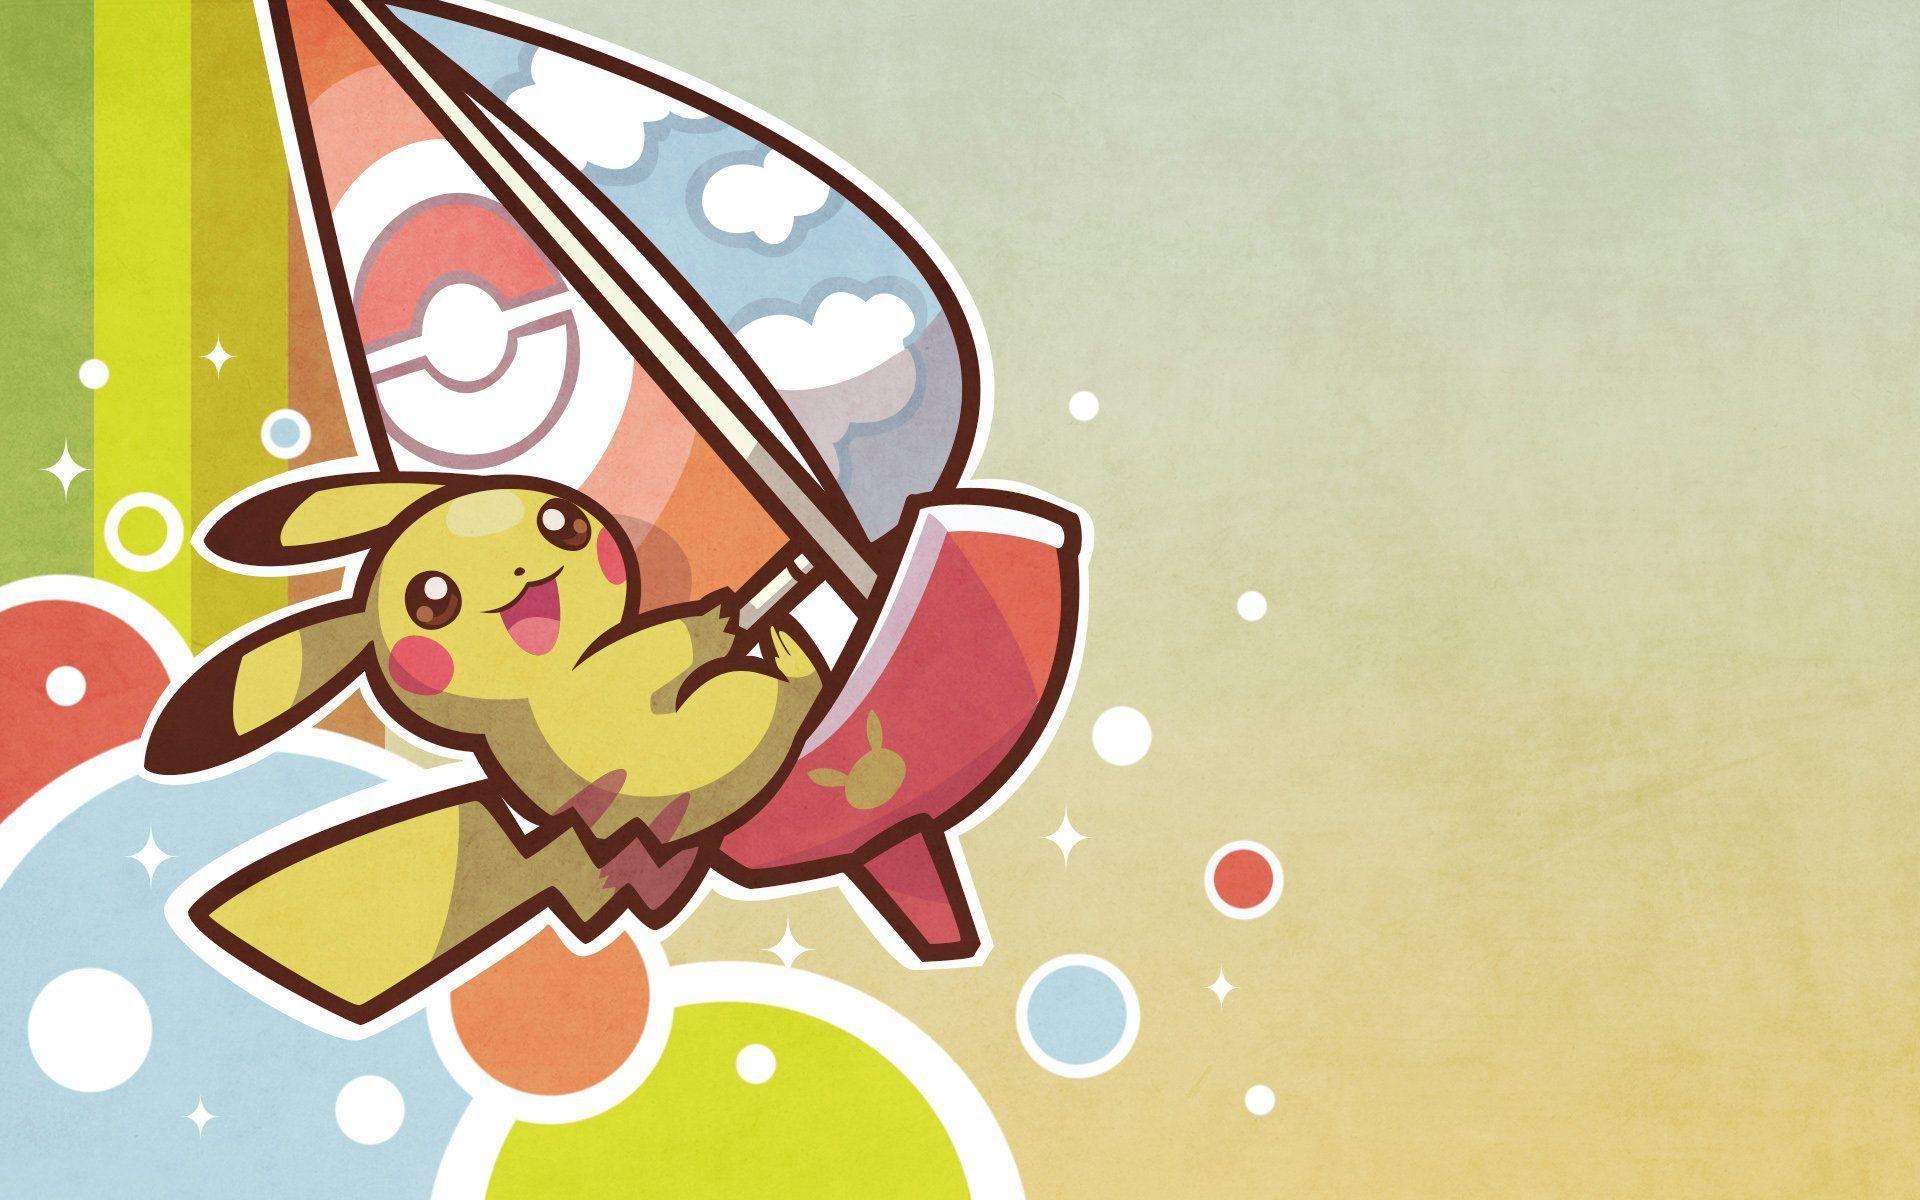 Pokemon Pikachu Wallpaper Background for Desktop 1920x1200